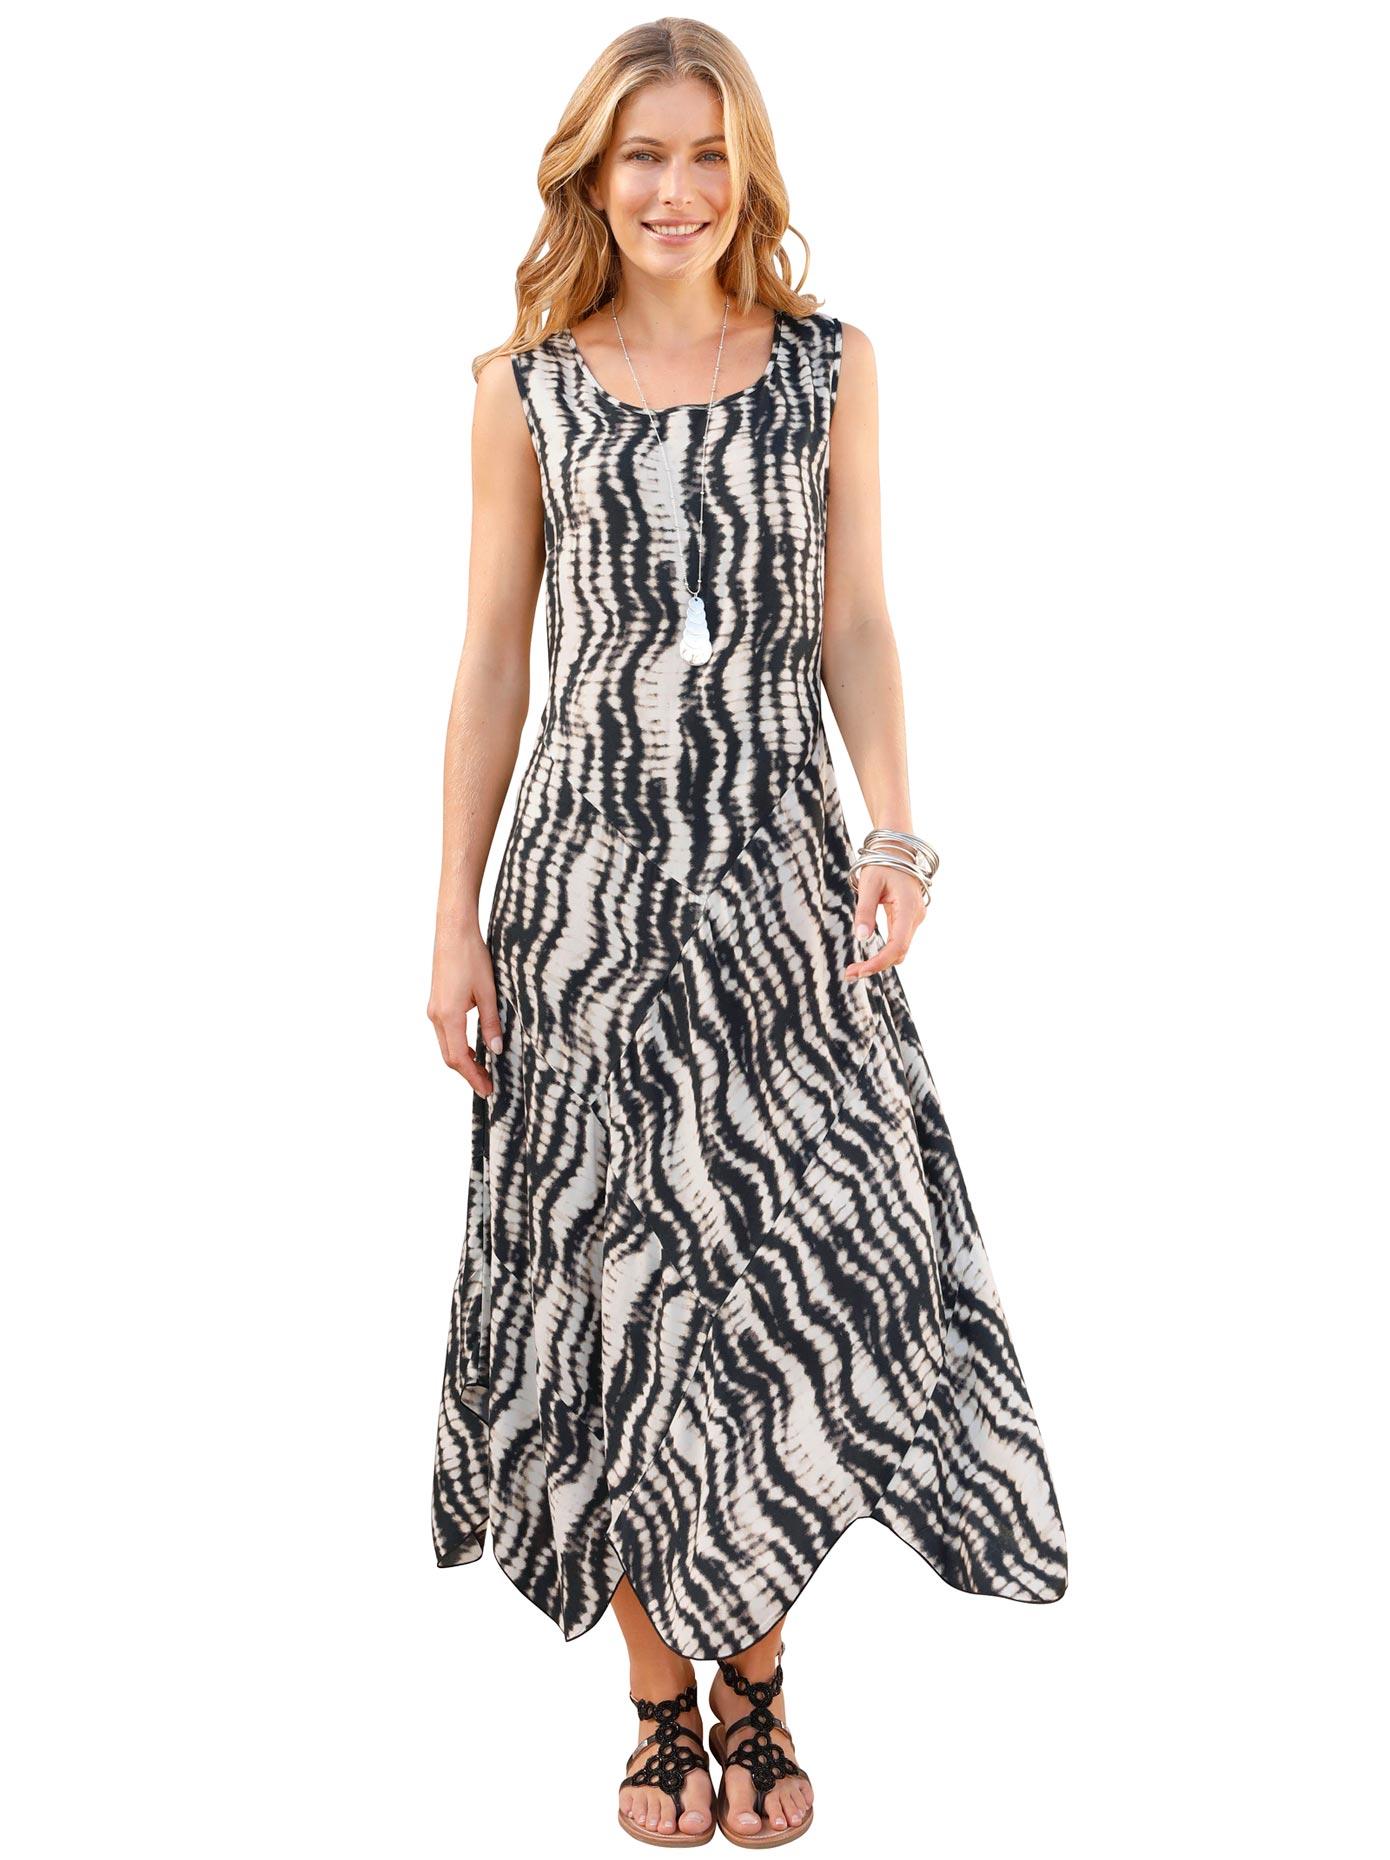 Classic Inspirationen Kleid im effektvollen Batik-Druck